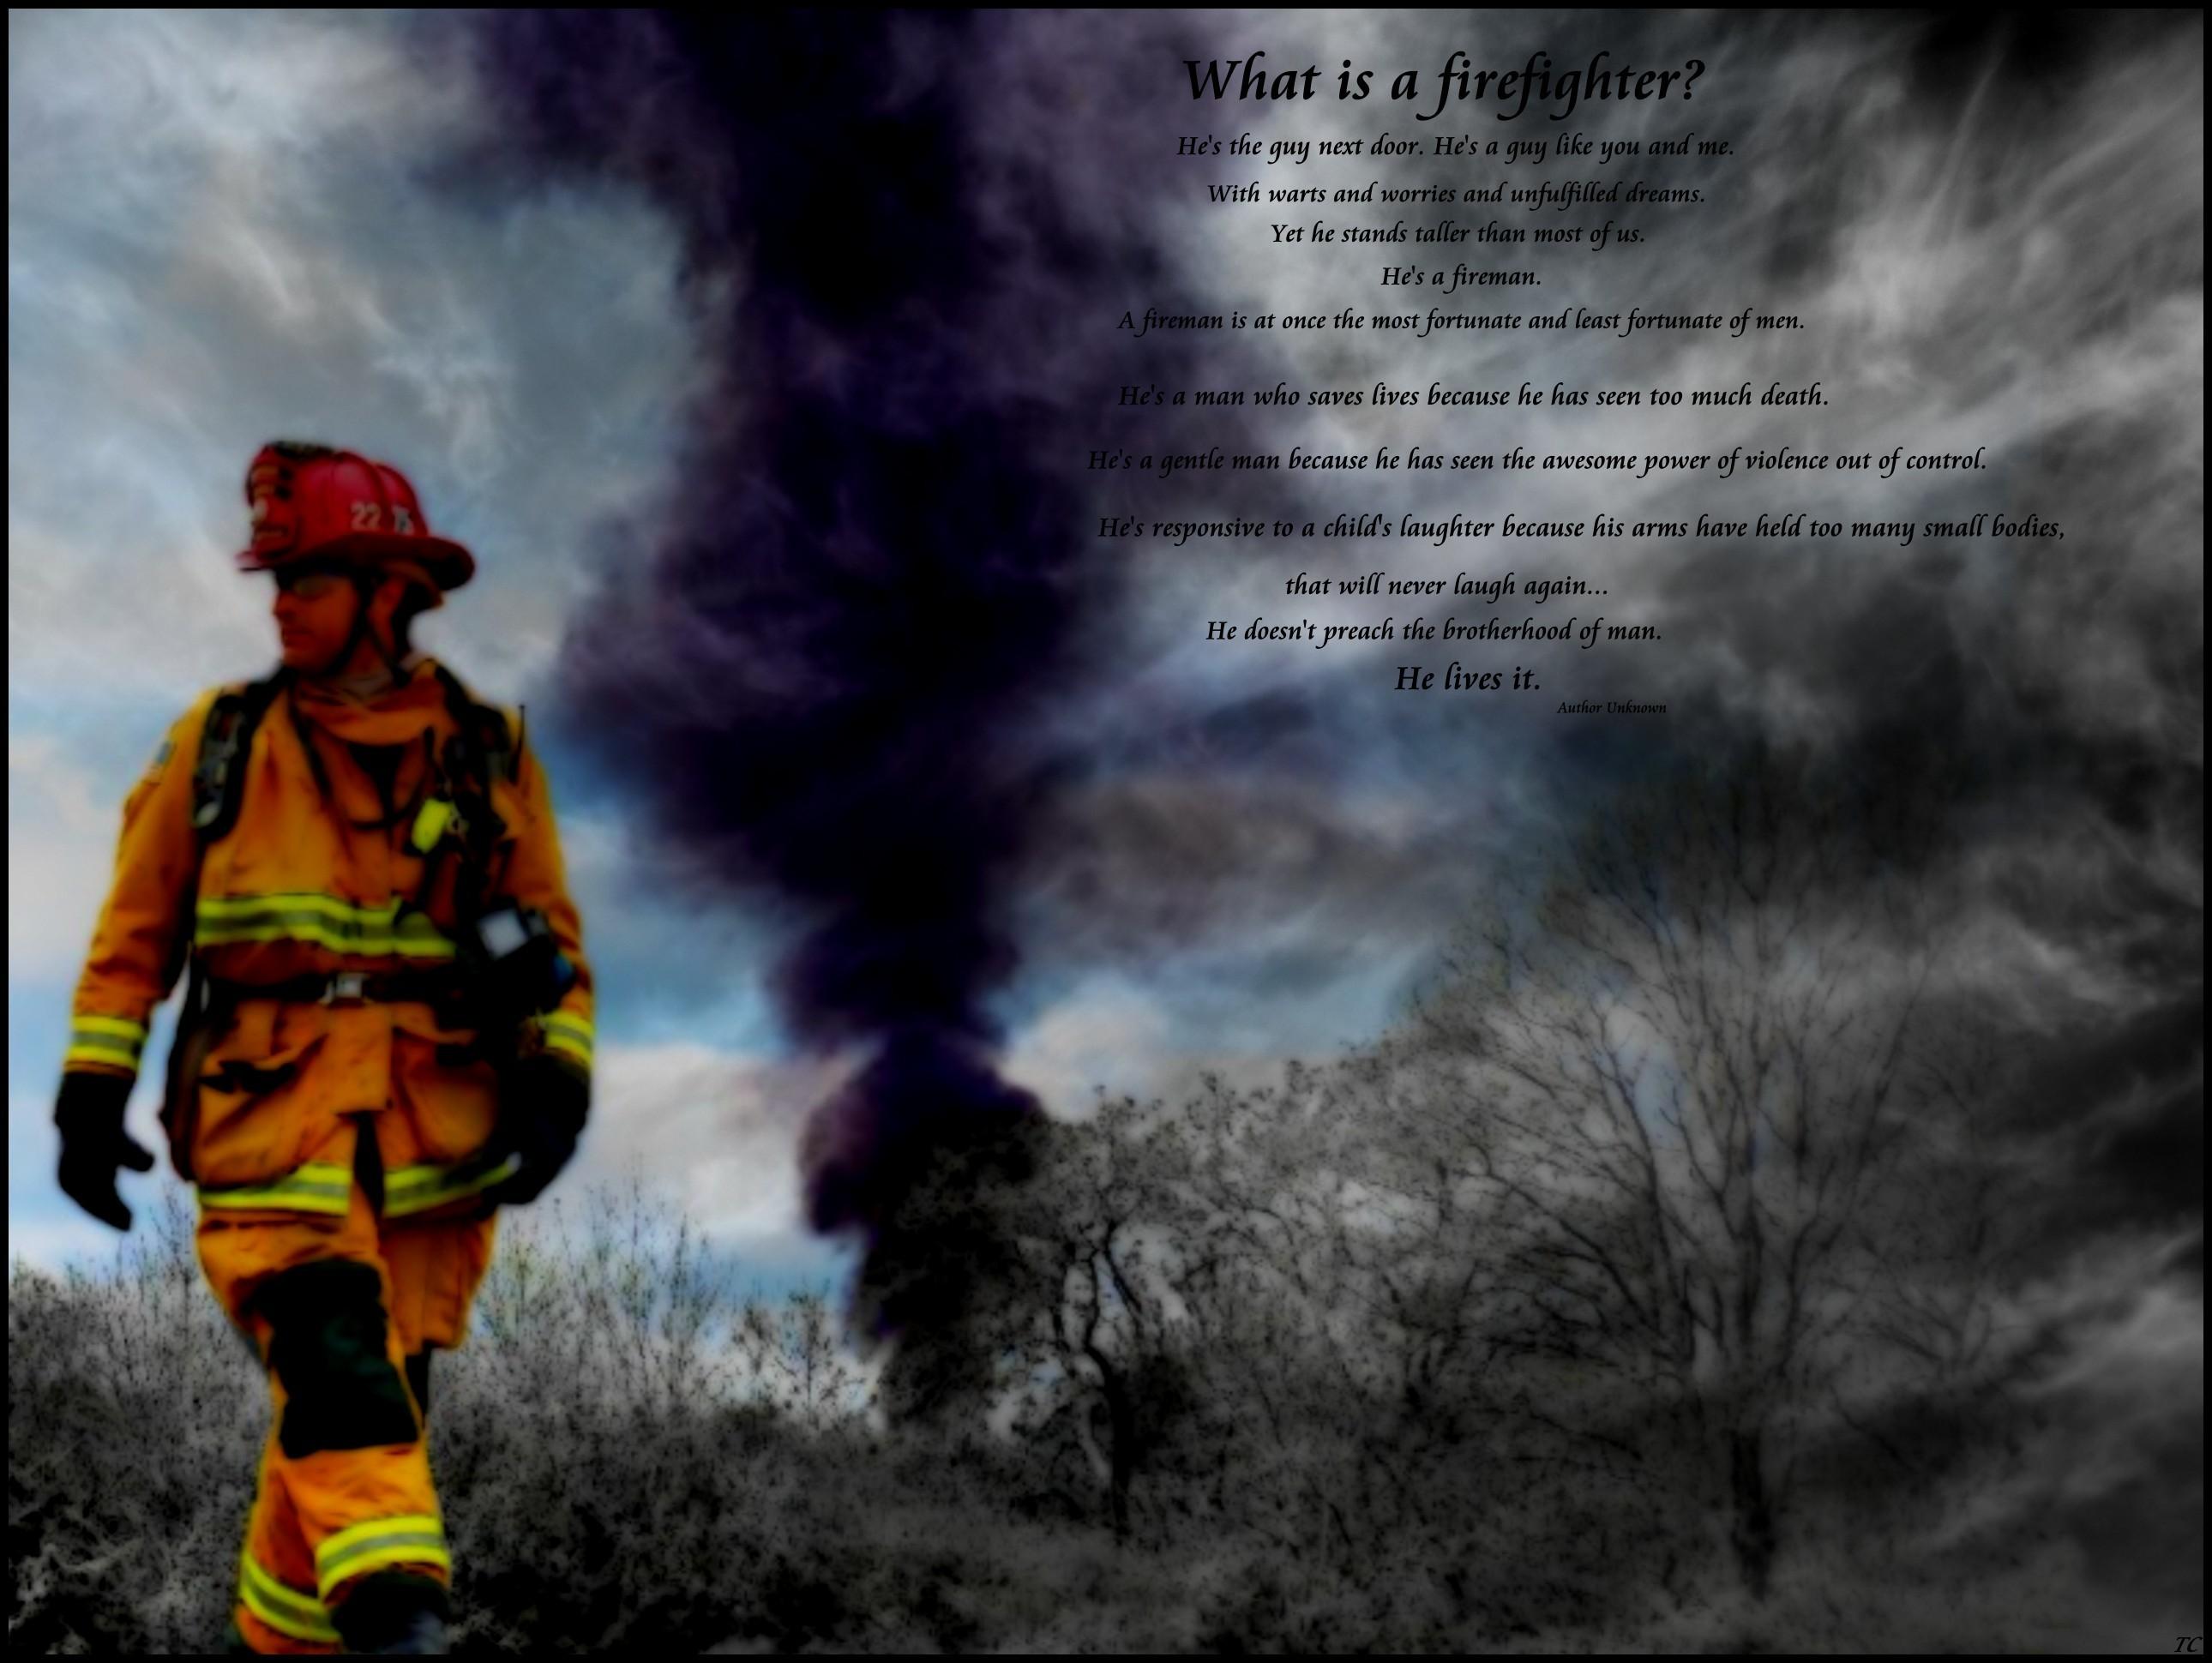 Res: 2580x1940, large-firefighter-desktop-backgrounds--for-4k-monitor-